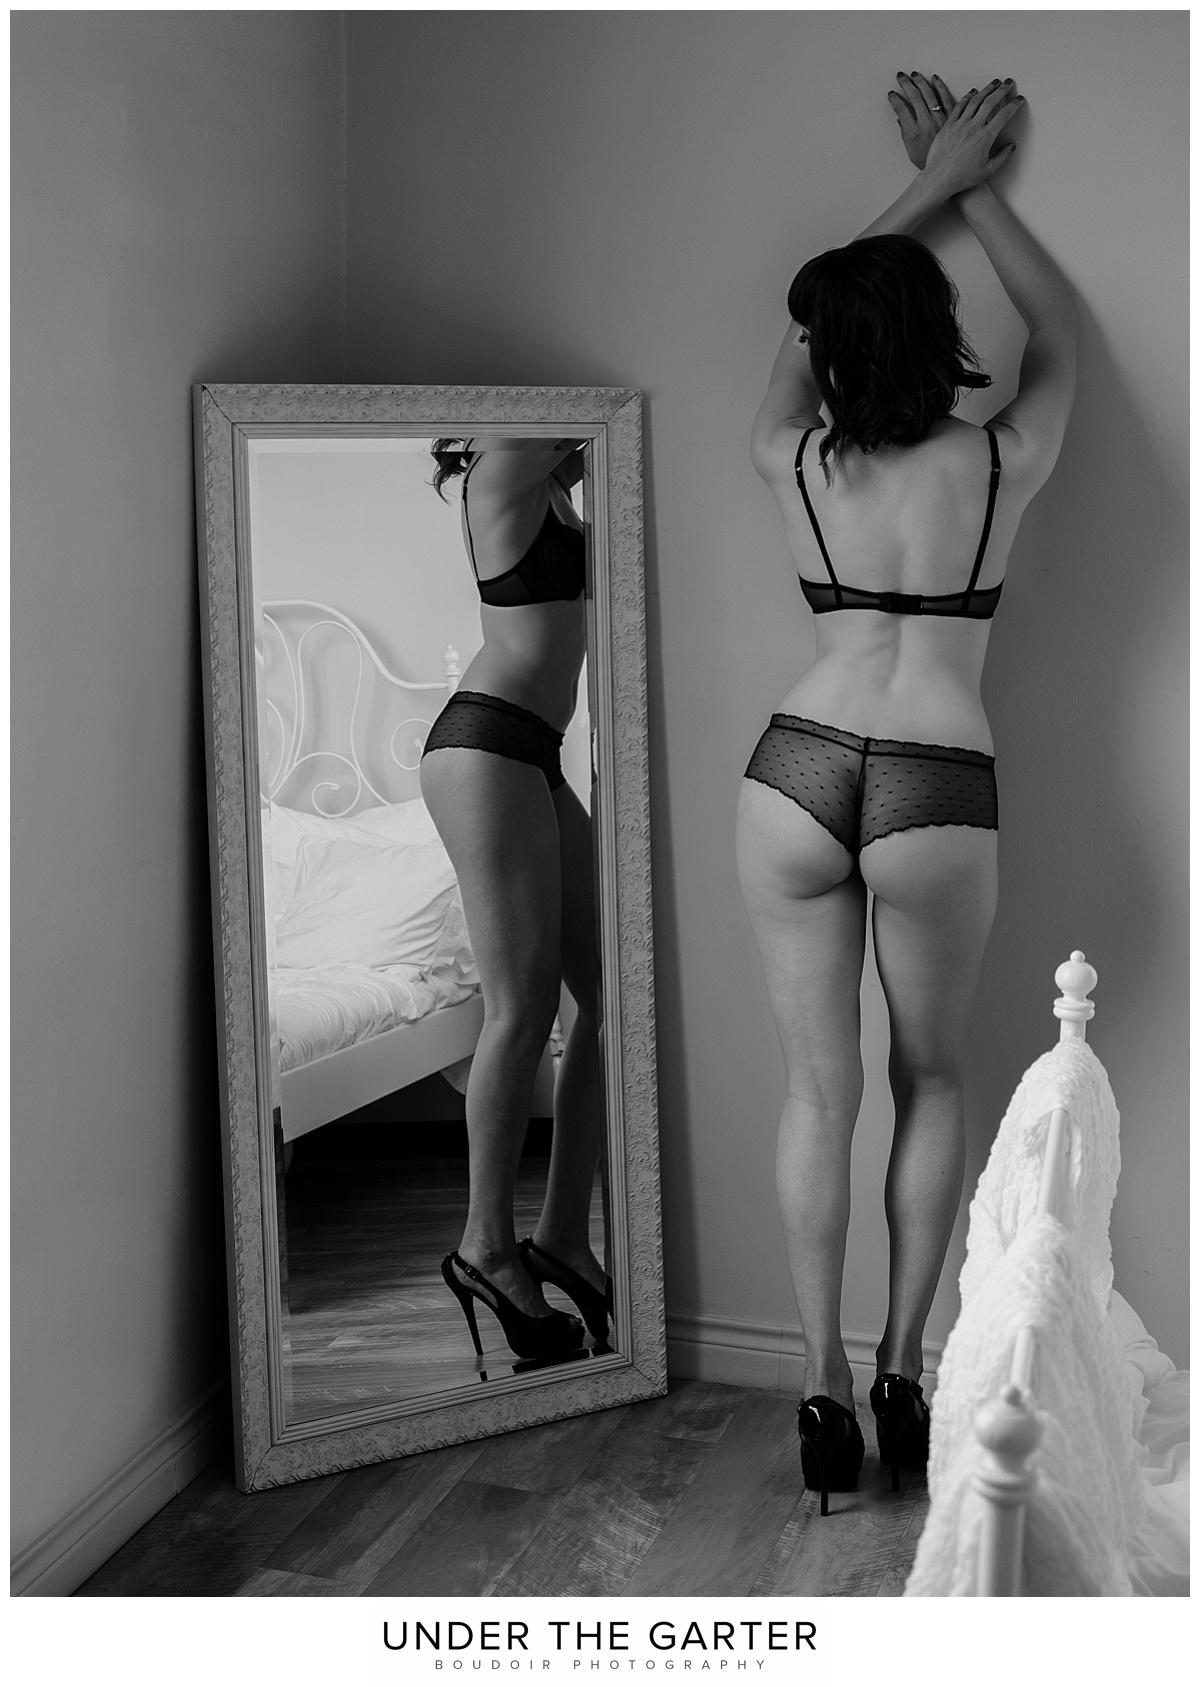 tushie black lace underwear long legs boudoir photography denver.jpg